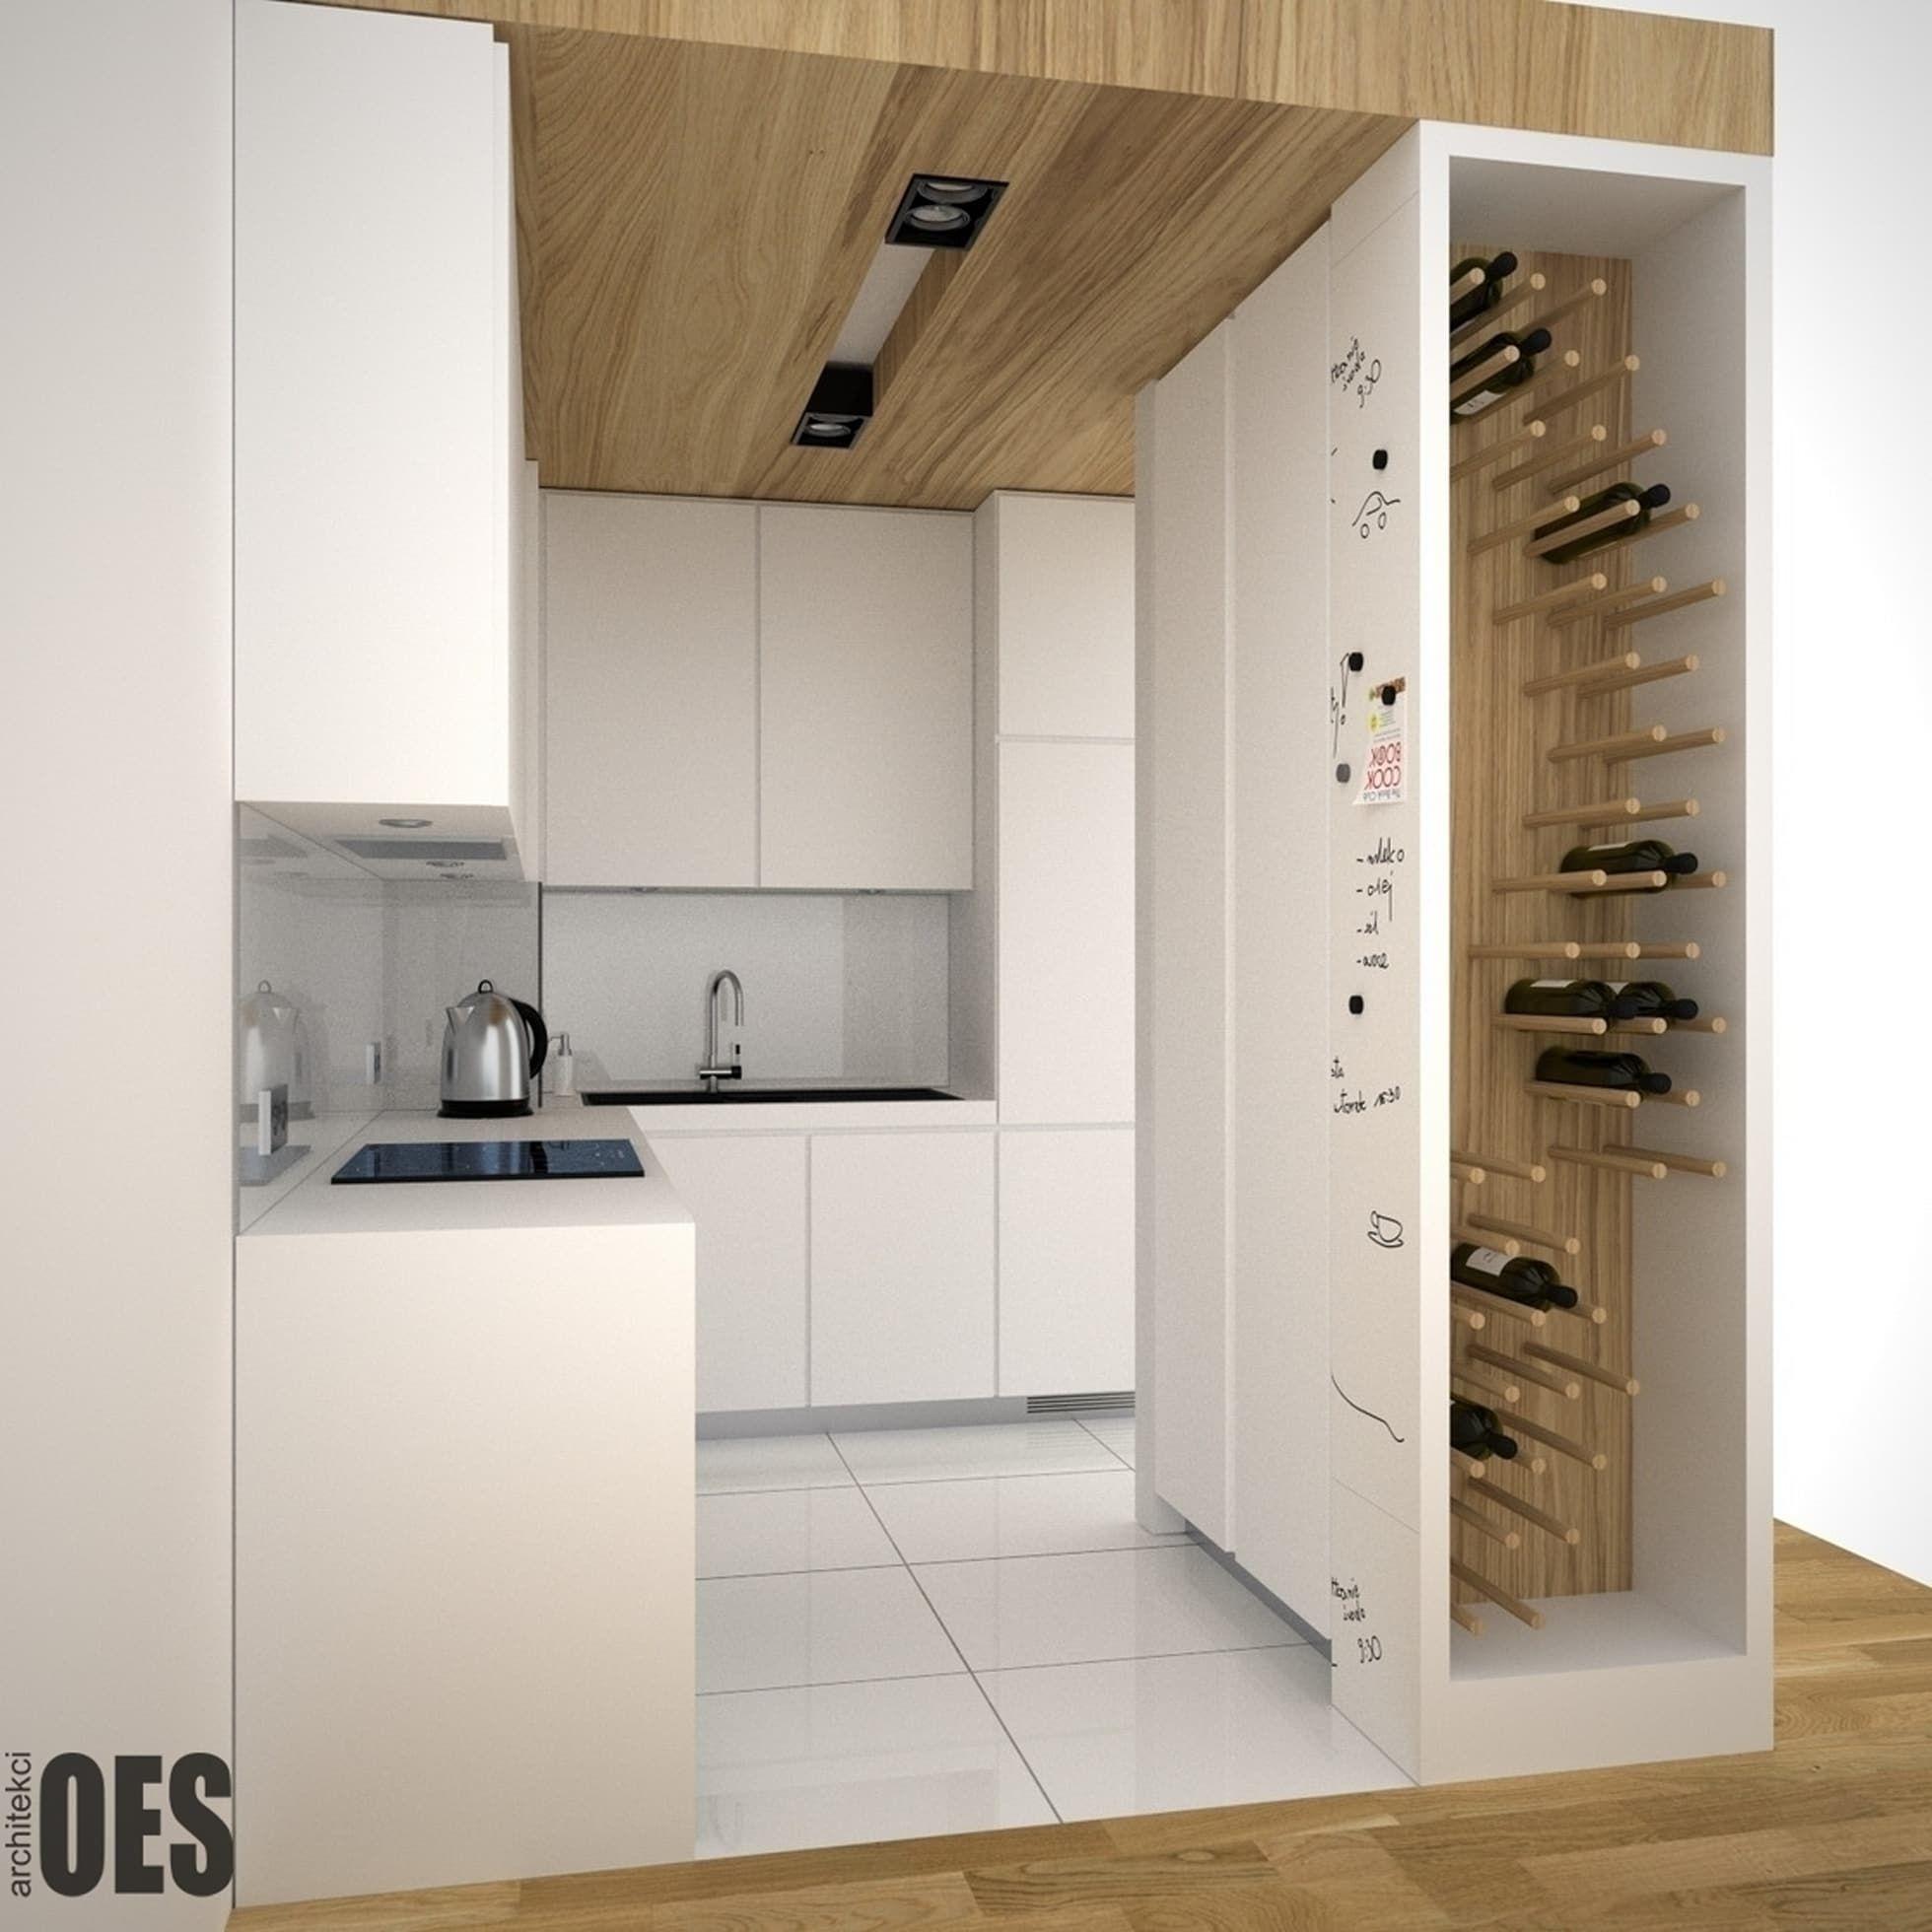 Projekt Malej Kuchni Oes Architekci Minimalistyczna Kuchnia Homify Modern Kitchen Design Kitchen Room Design Home Decor Kitchen